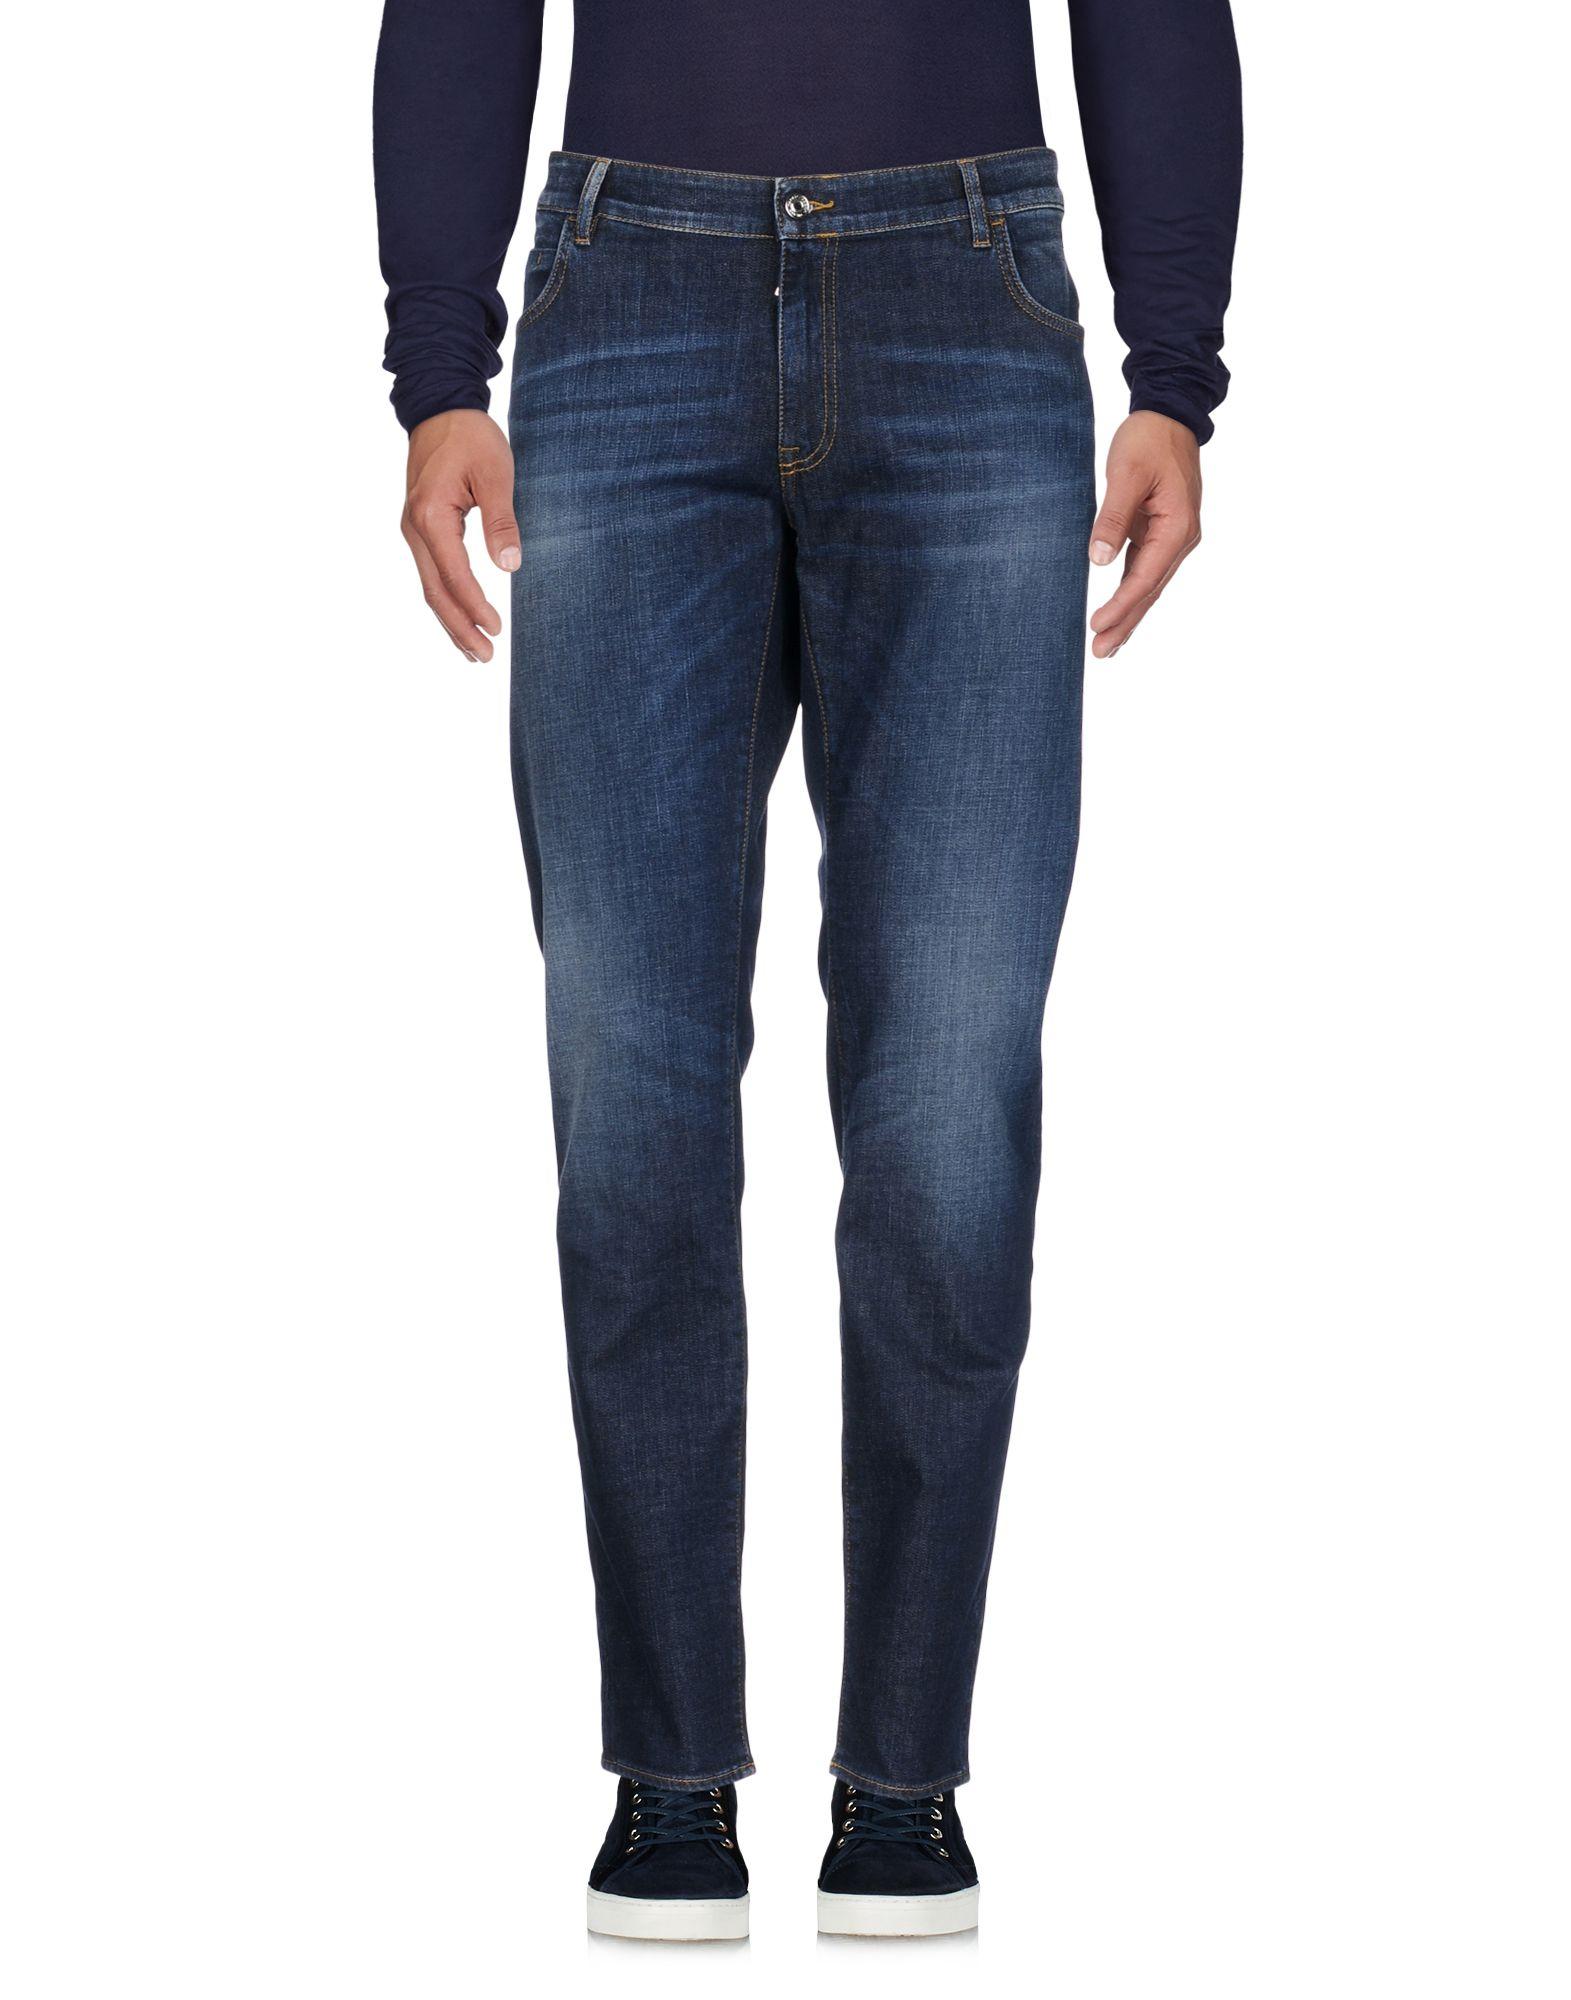 Pantaloni Jeans Jeans Jeans Paolo Pecora Uomo - 42681534GH 2fe3d9